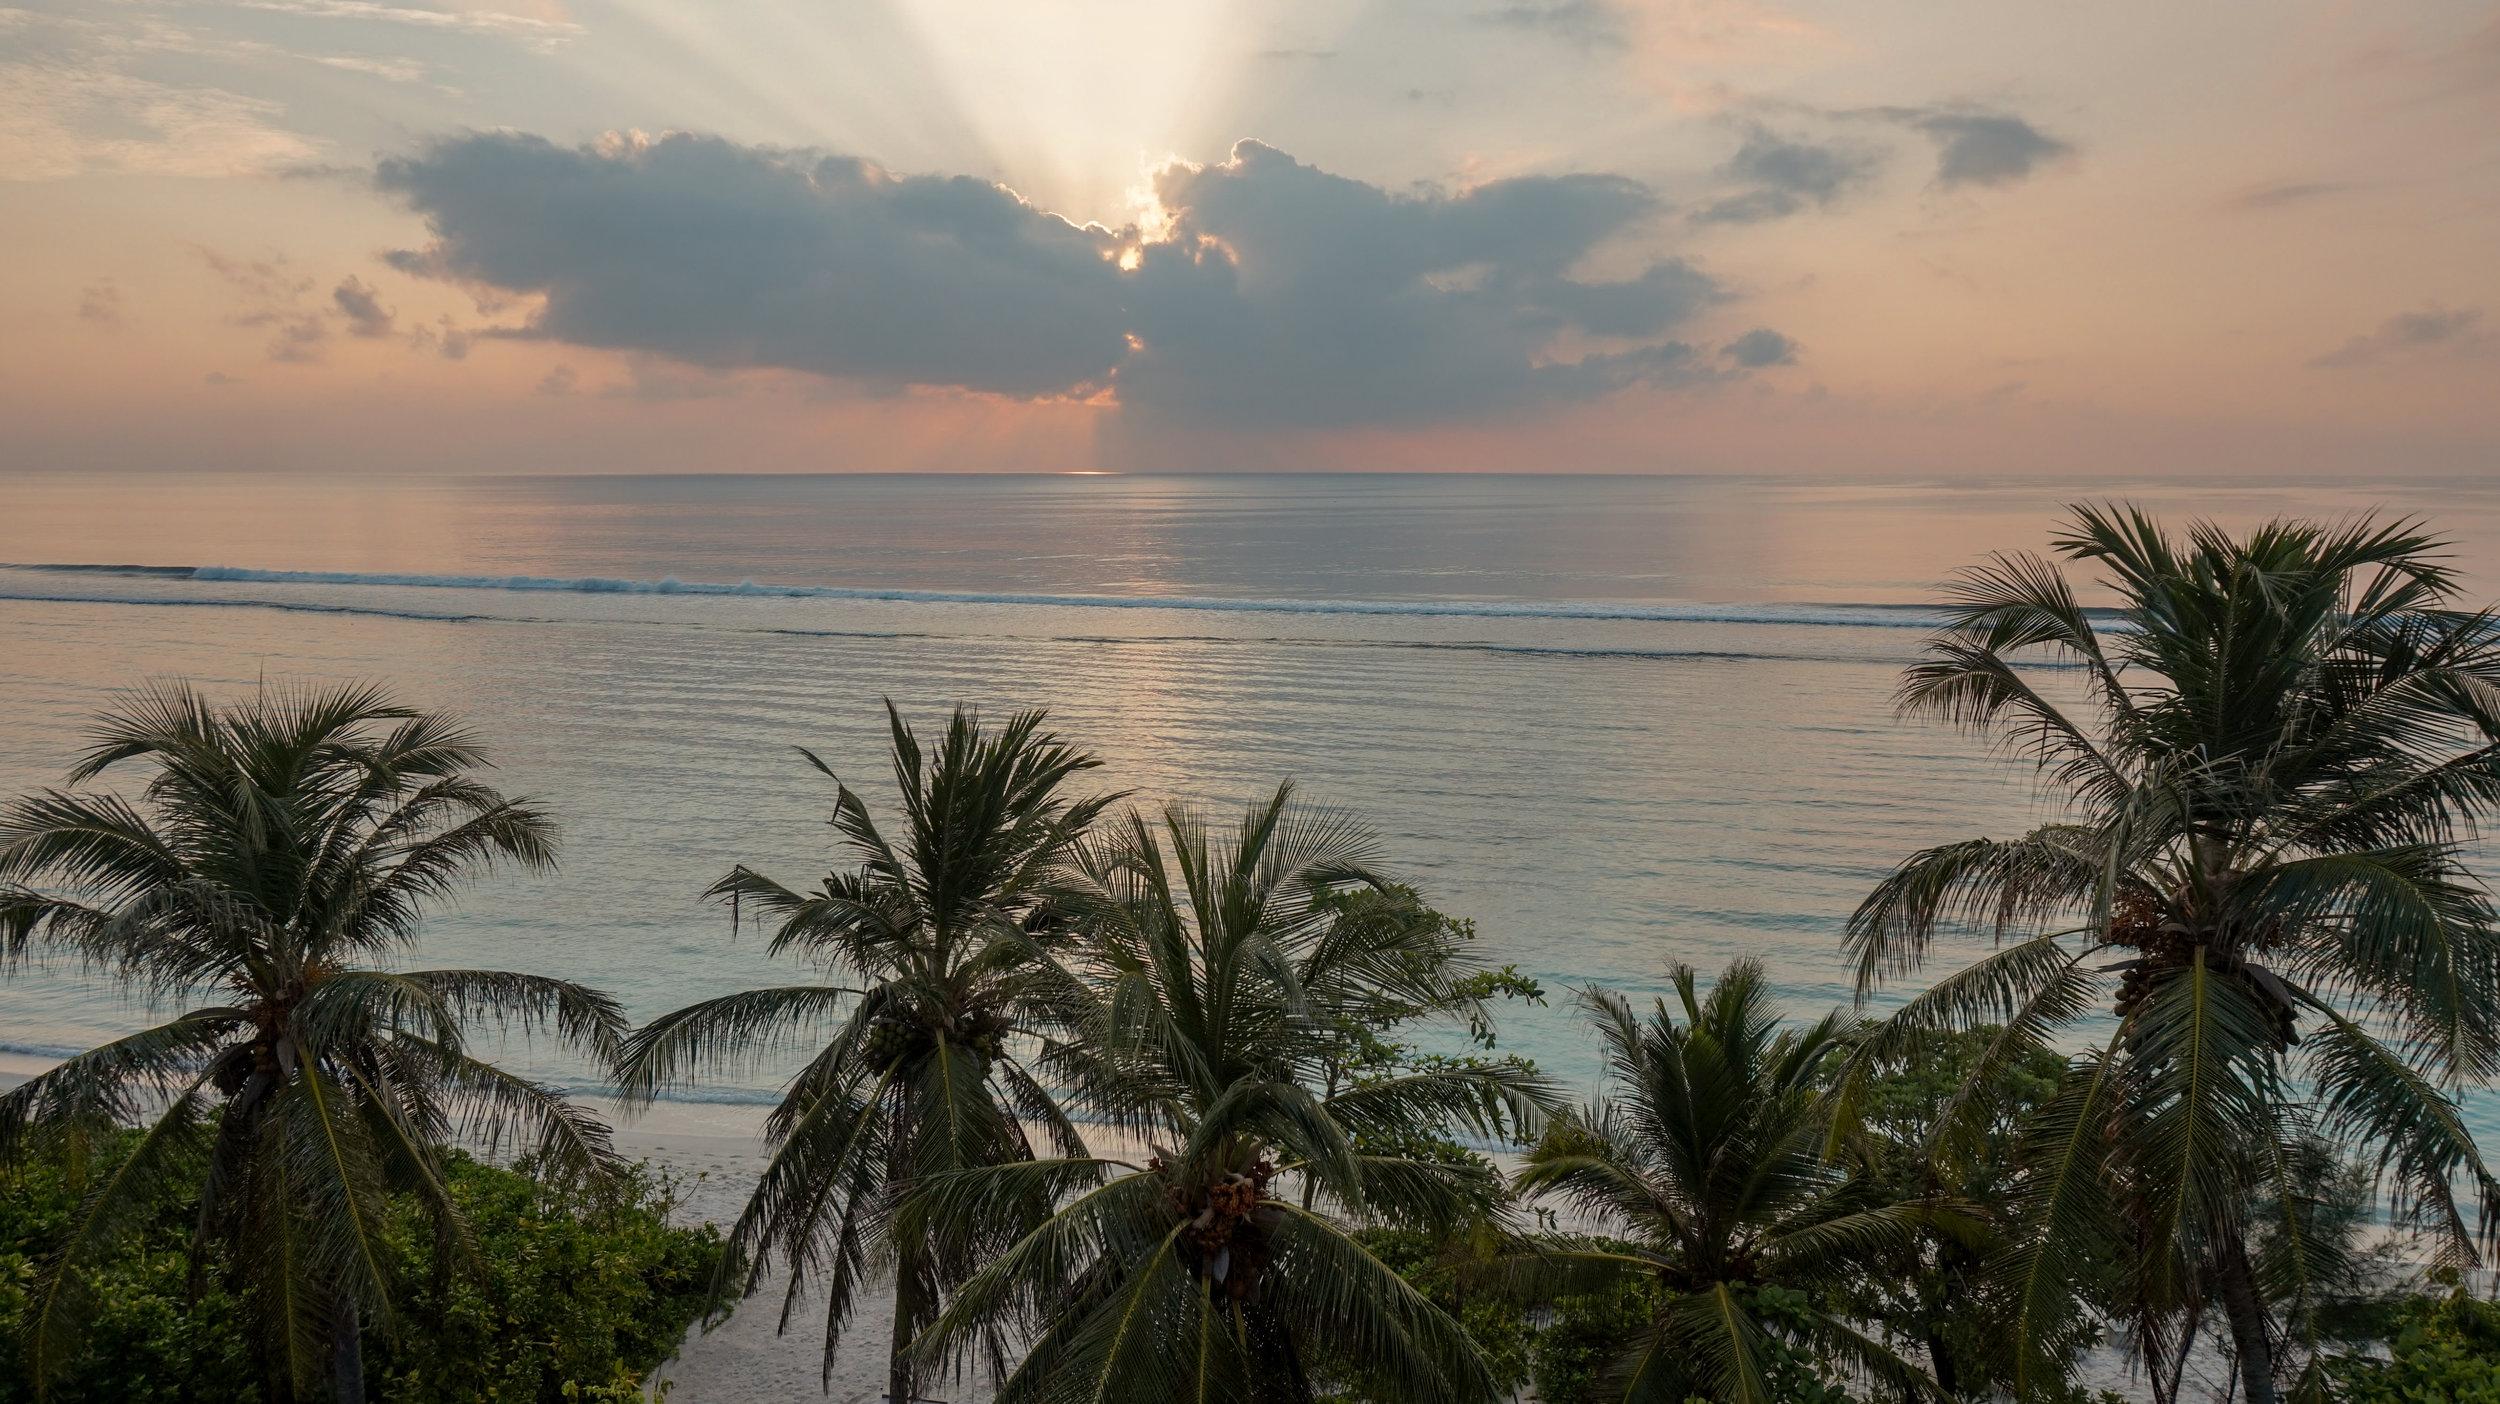 maldives-island-hulhule-island-2019.jpg